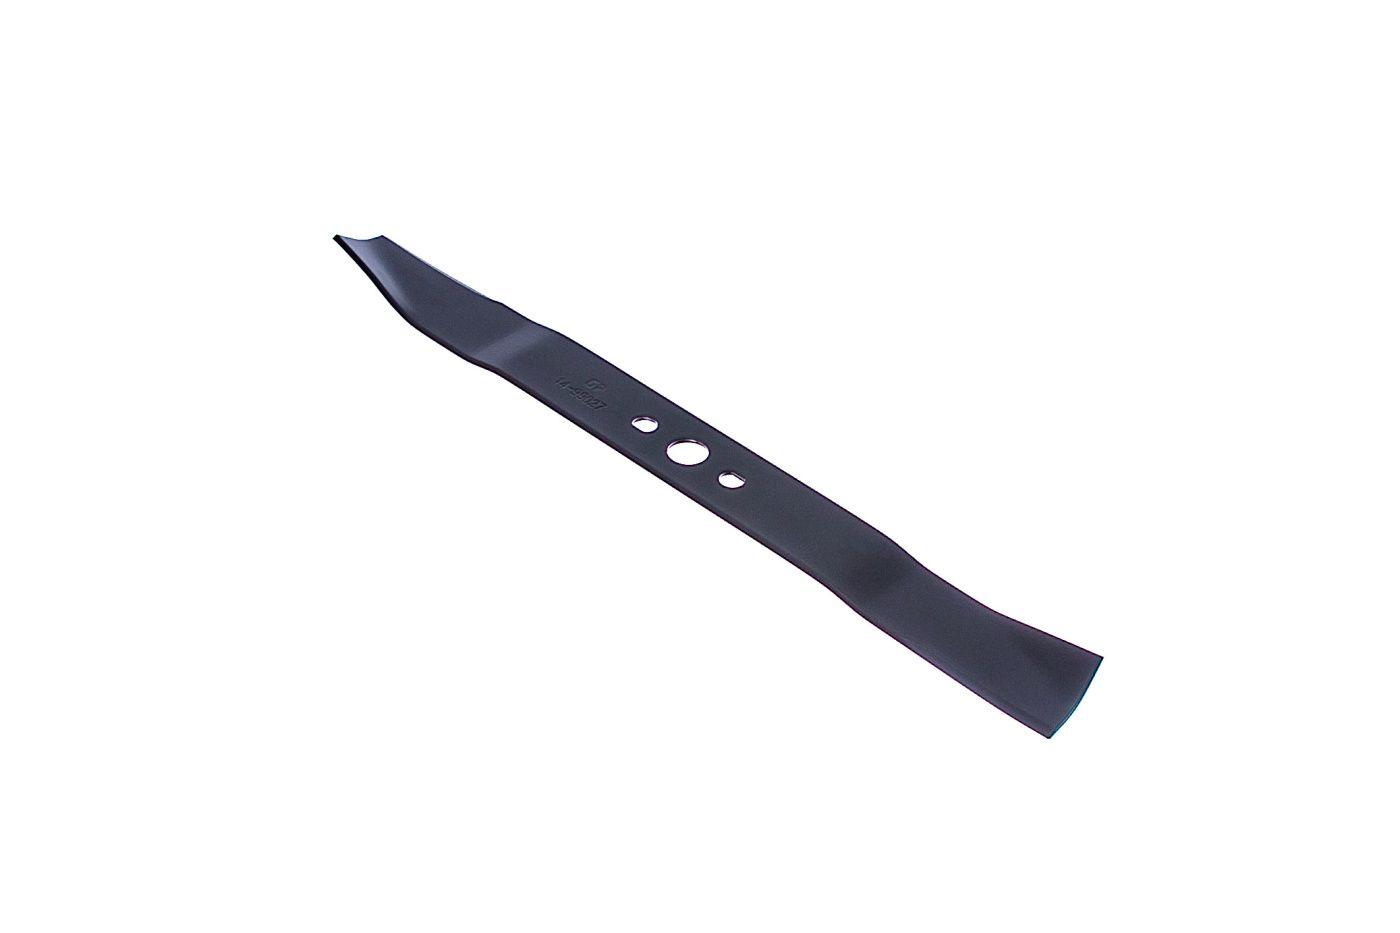 Žací nôž motorových kosačiek 40cm NAC DY164PMB HORTMASZ DYM 1563 DYM 1564 - 26300100401